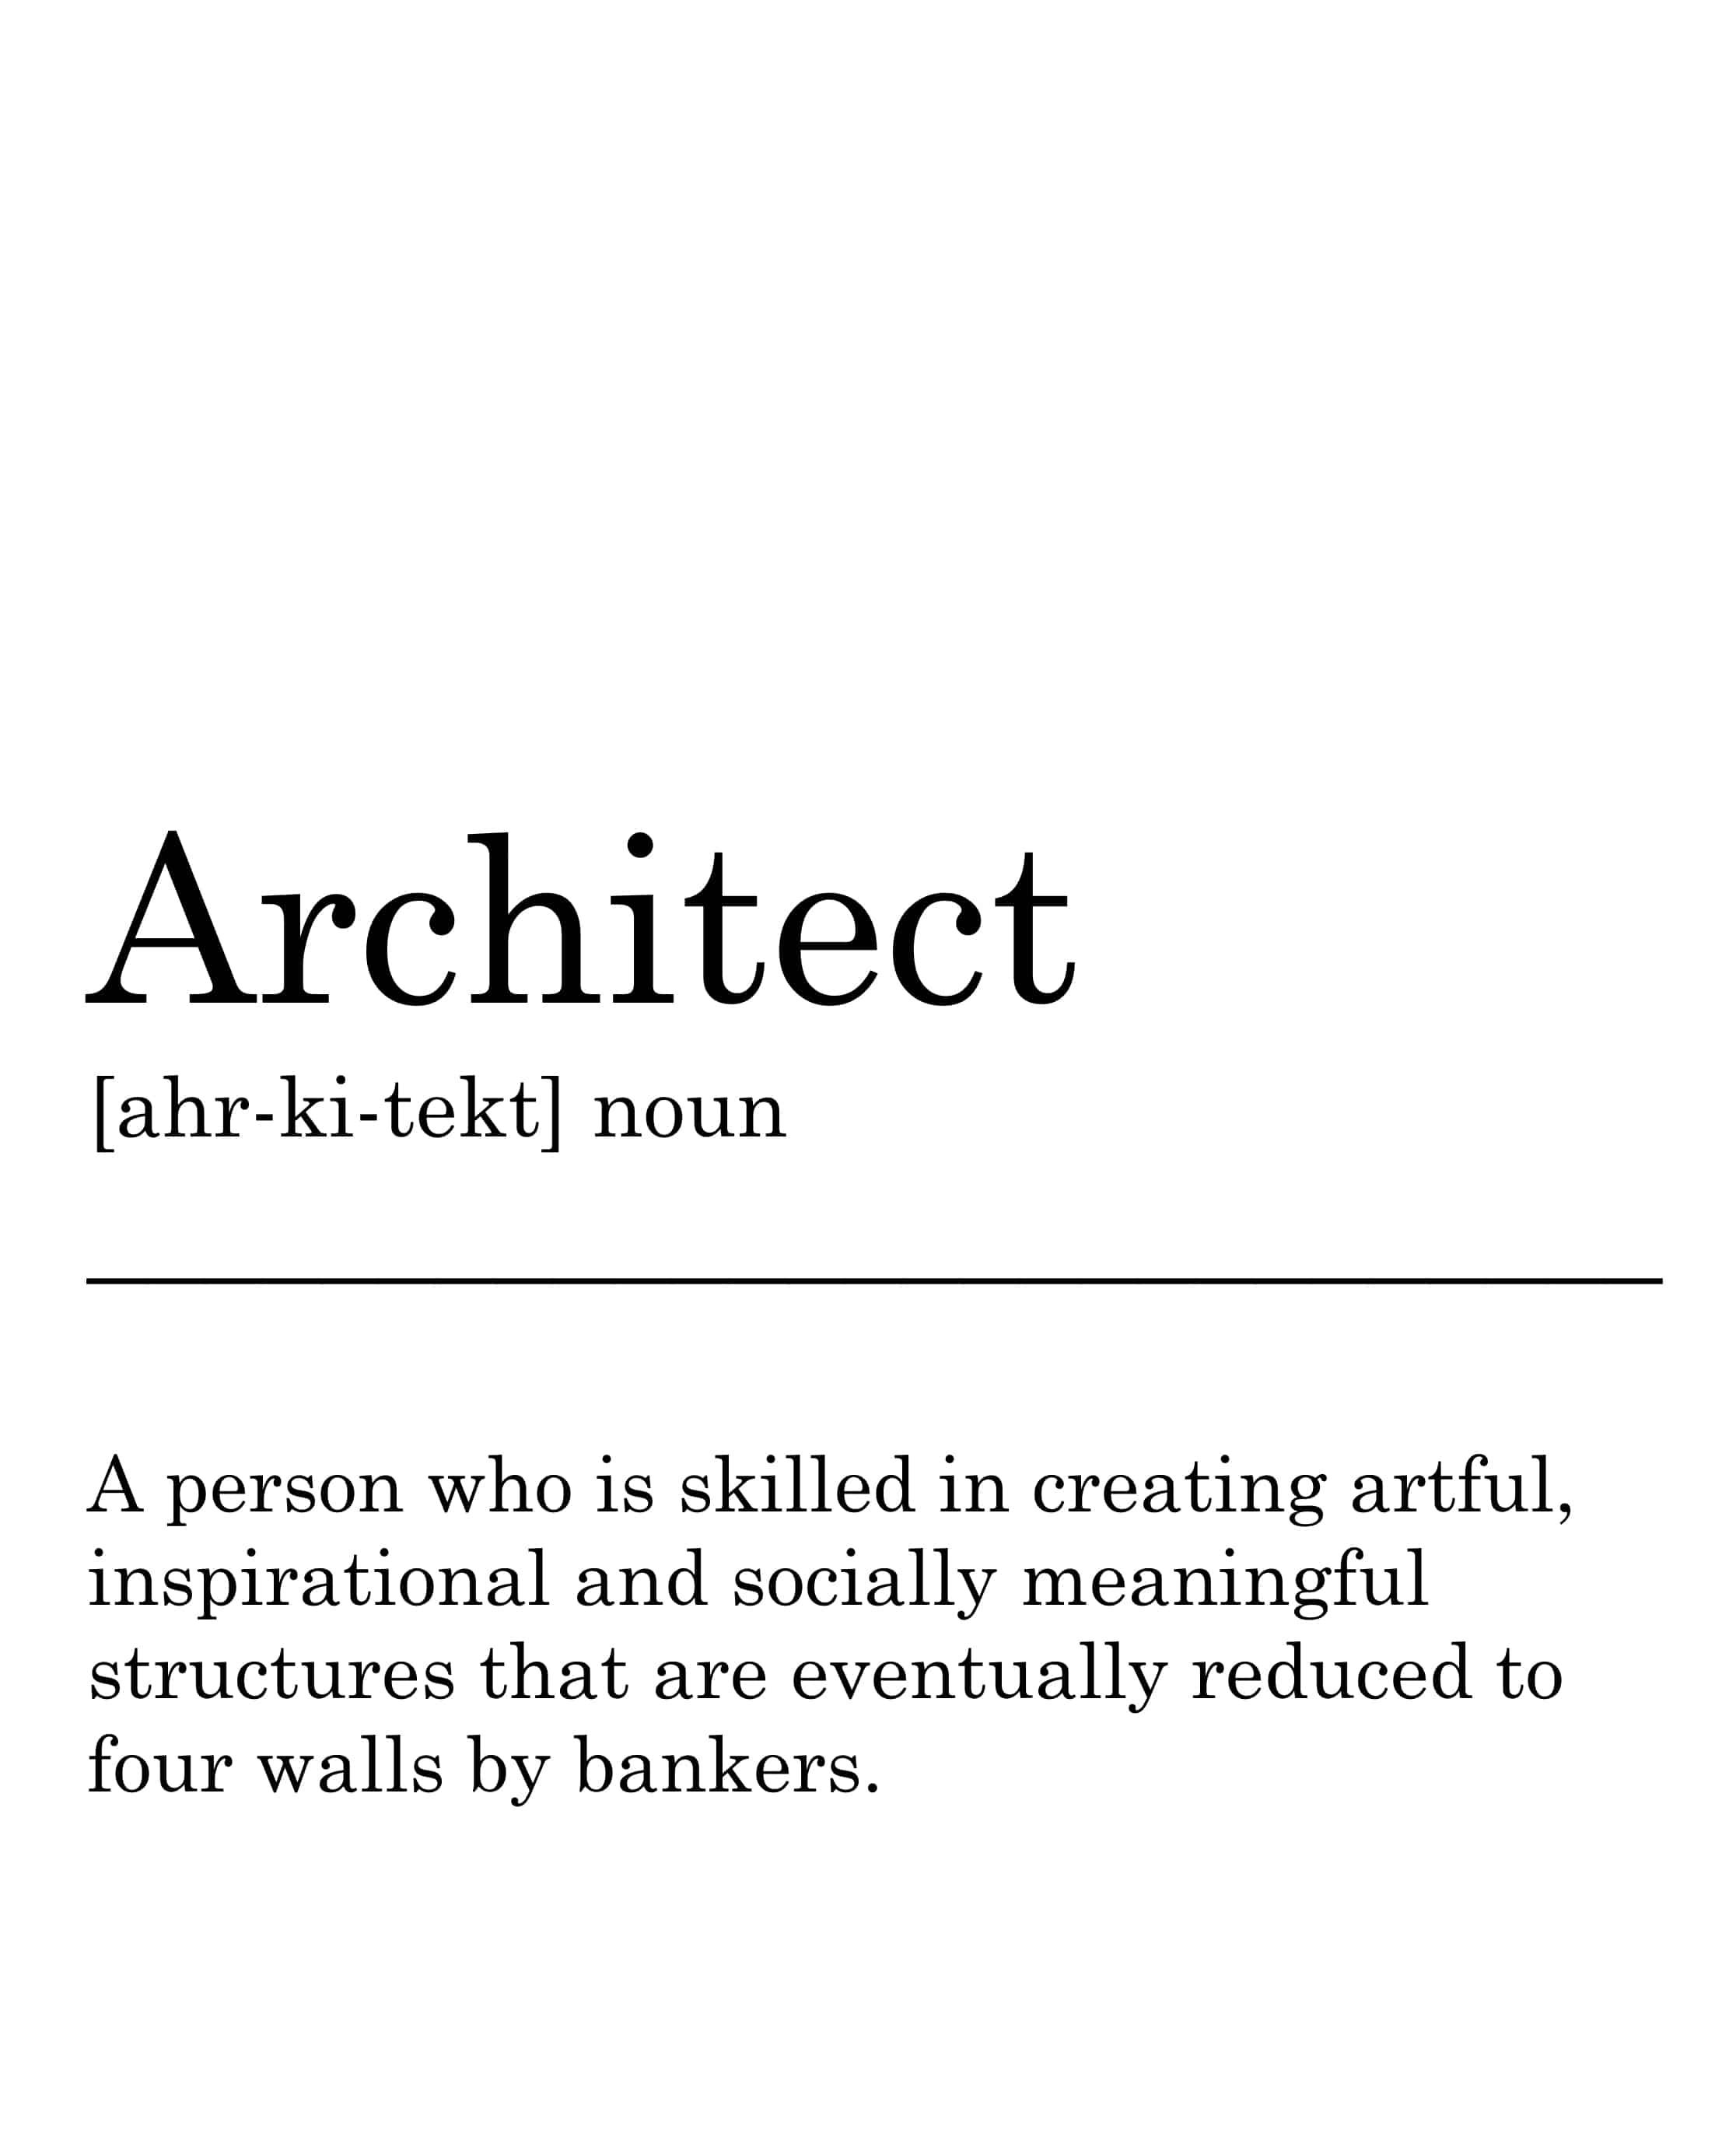 architect definition